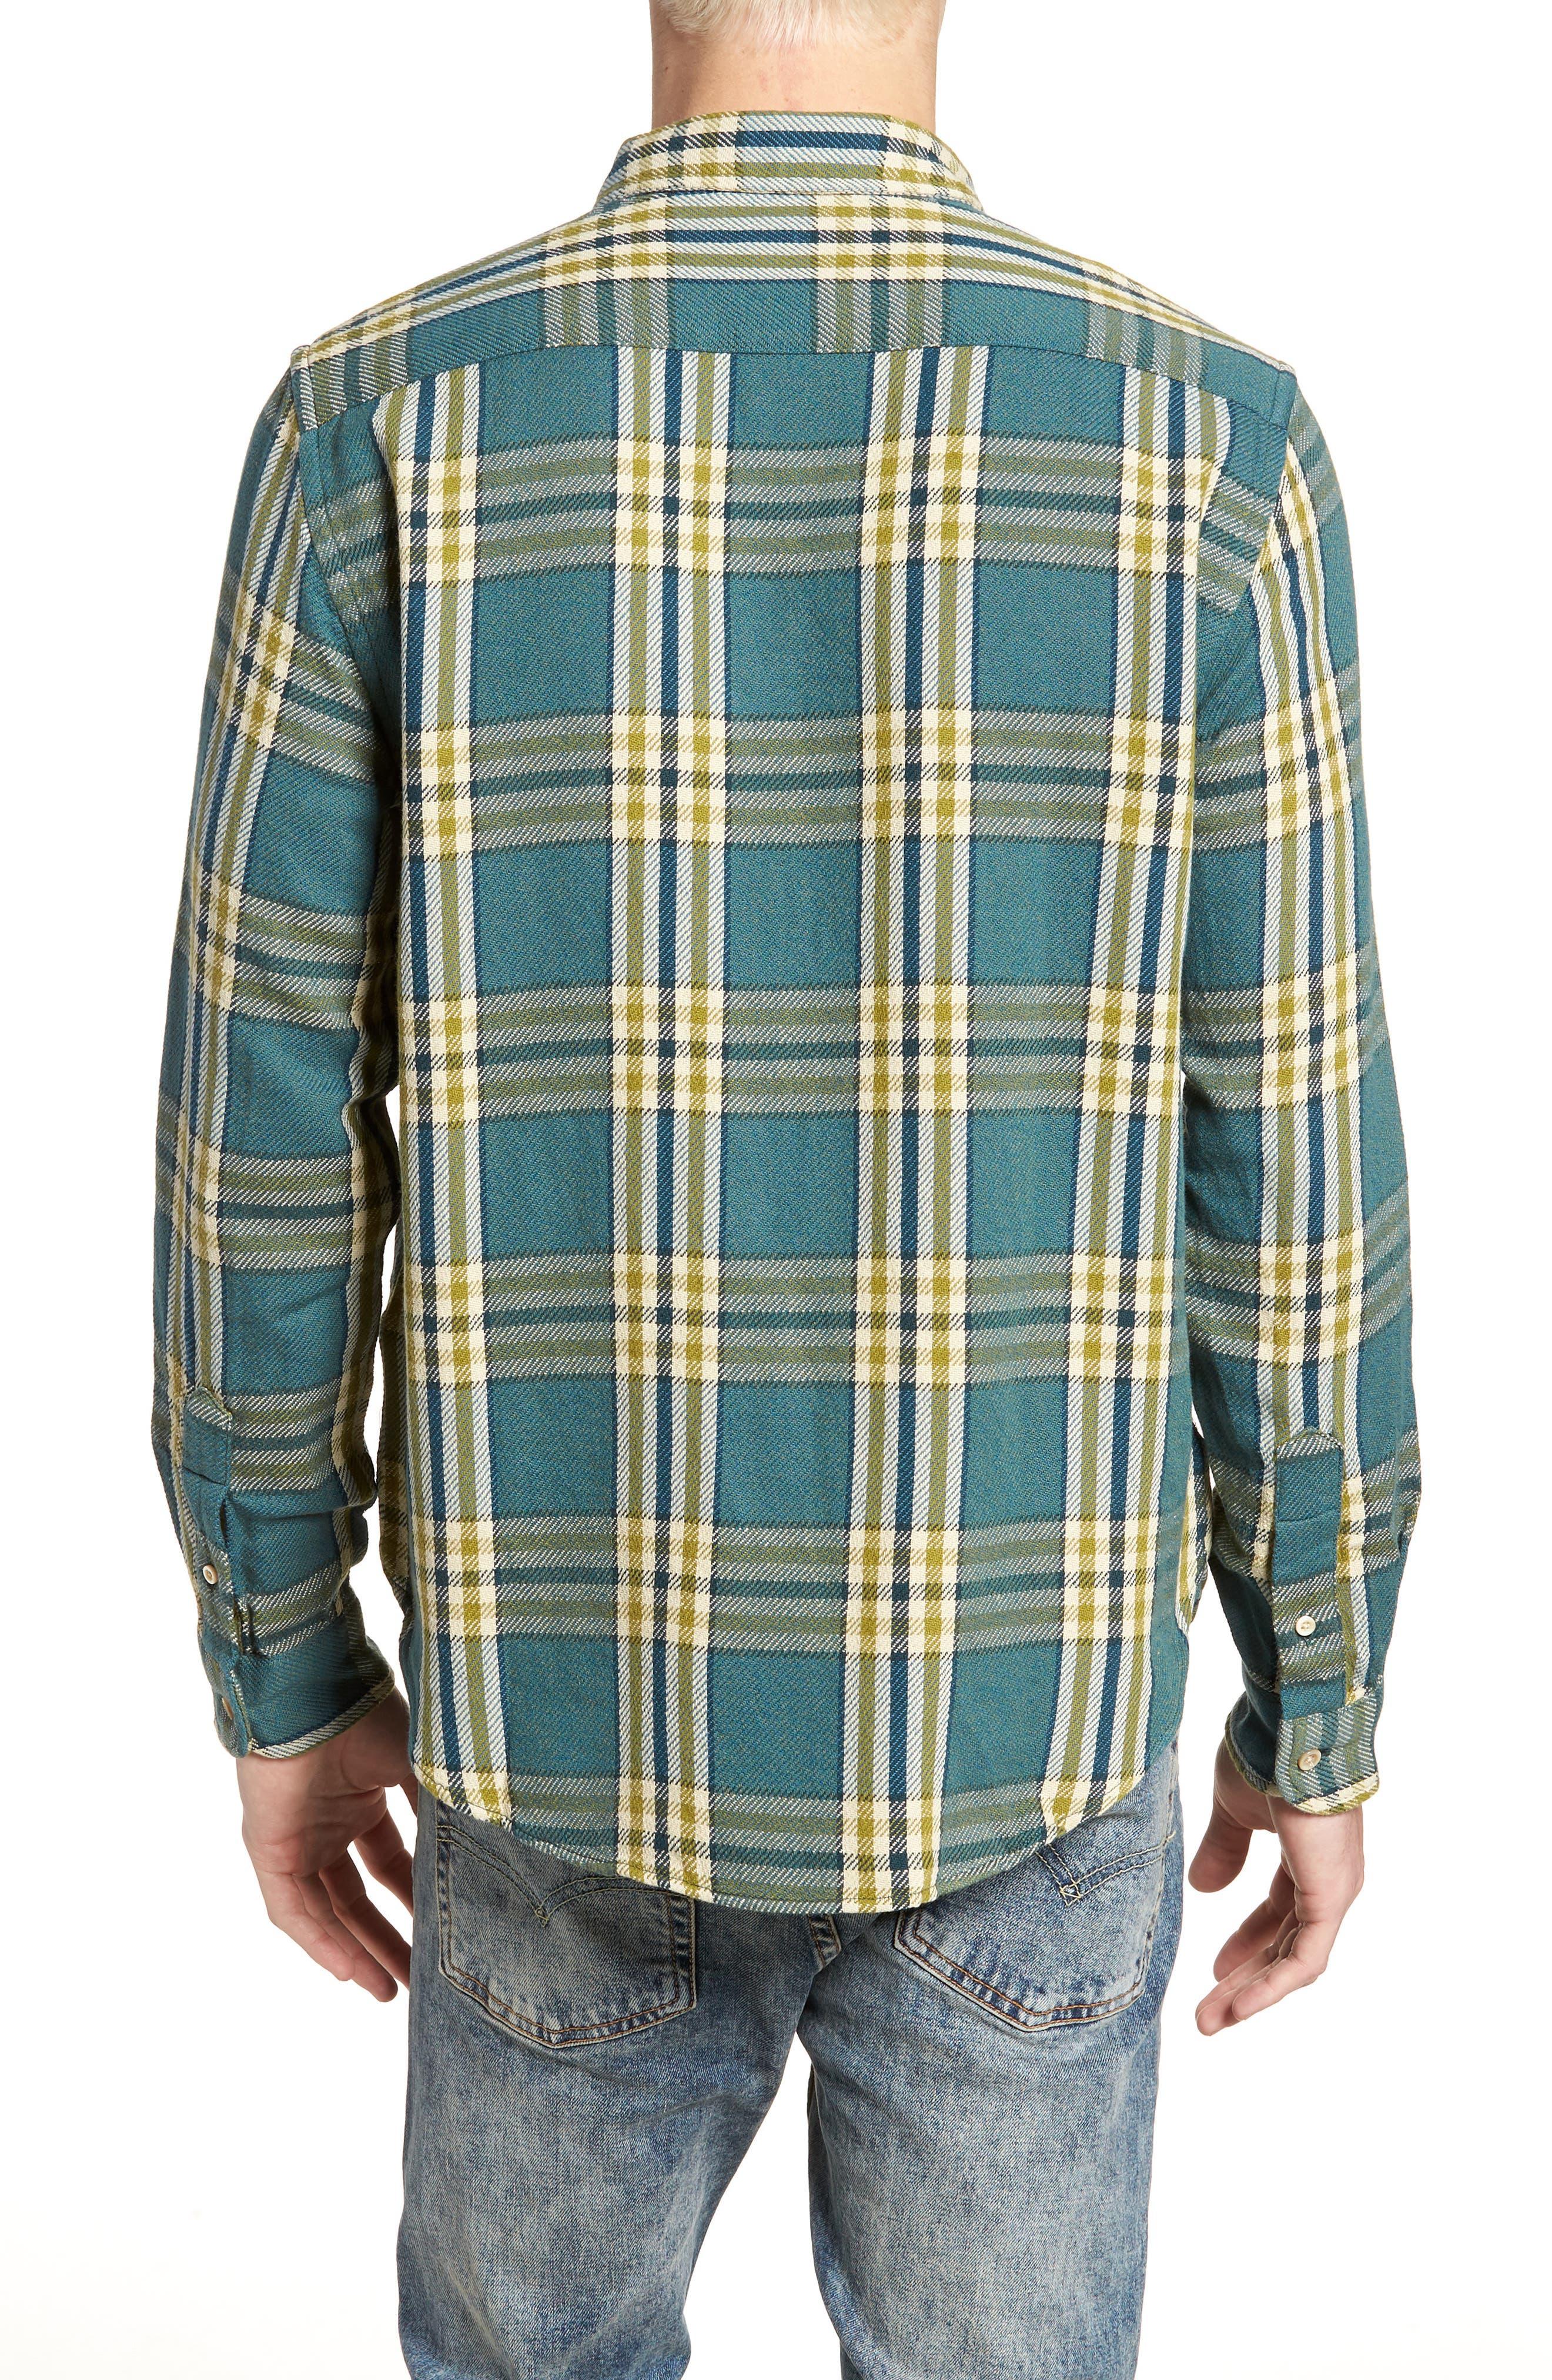 Shorthorn Western Shirt,                             Alternate thumbnail 3, color,                             Under Water Blue Multi